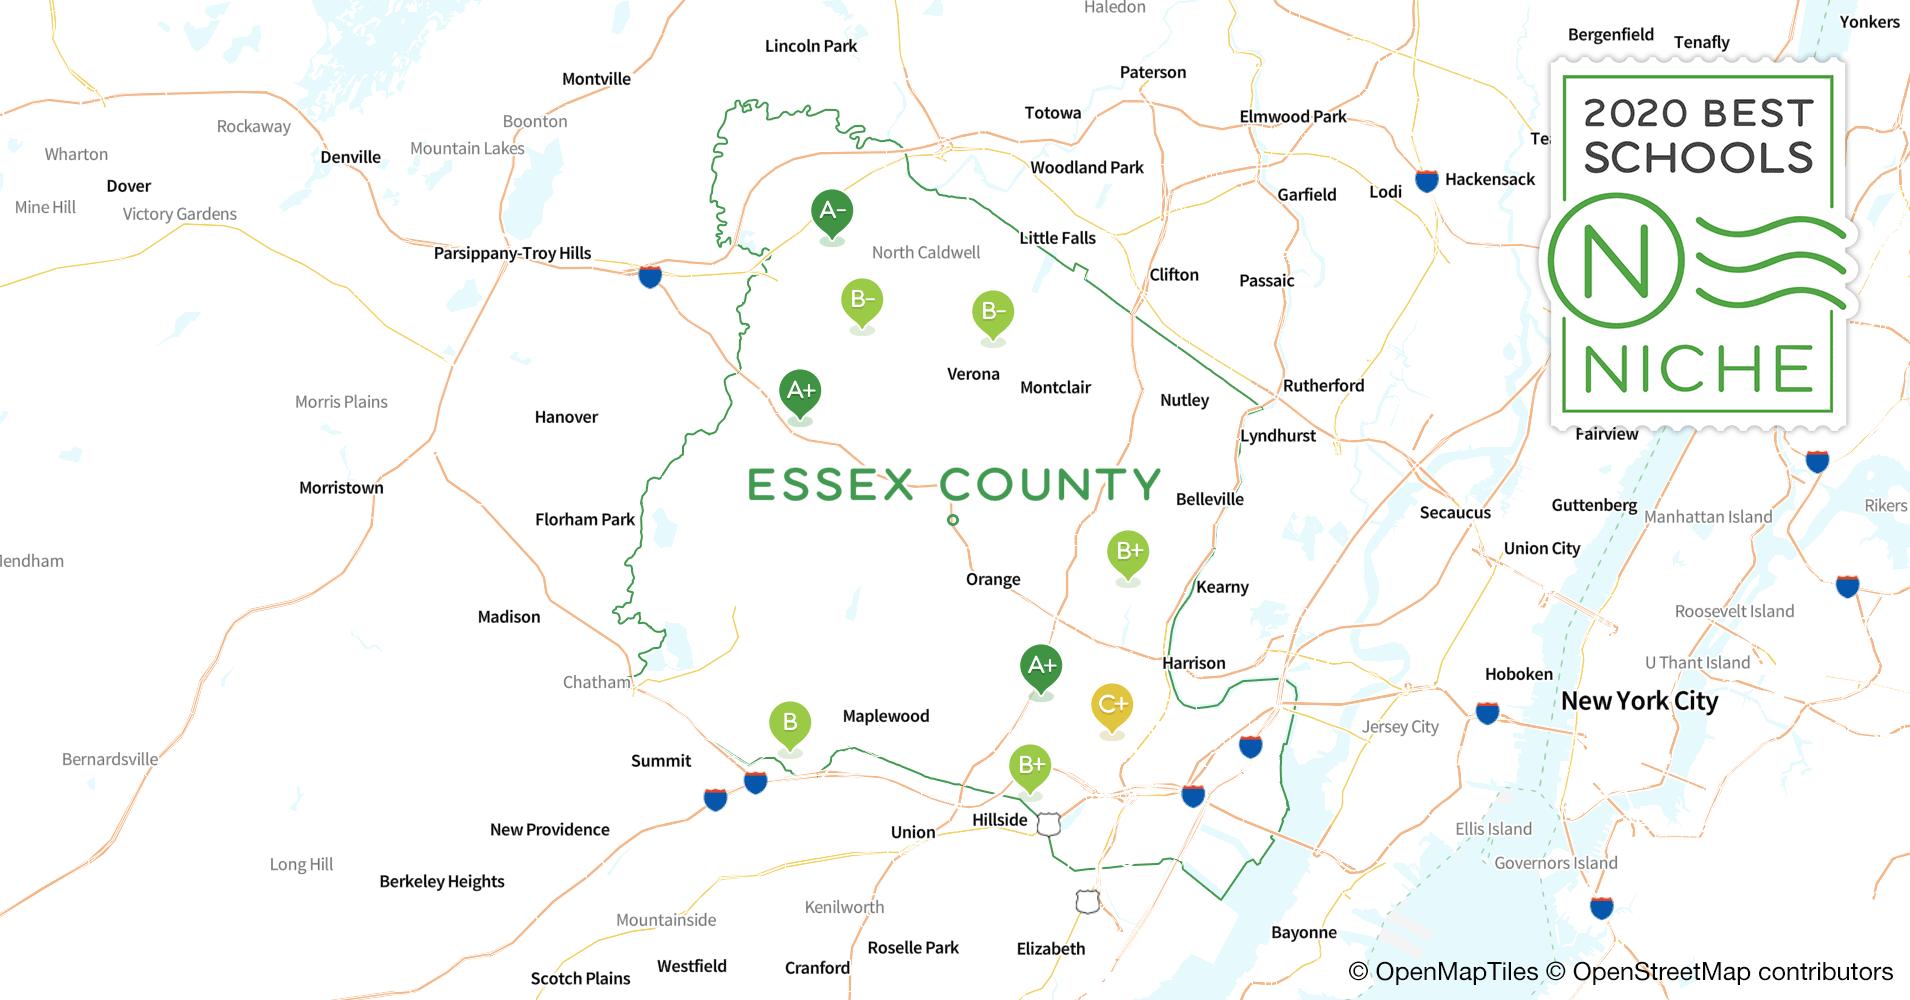 2020 Best Private High Schools in Essex County, NJ - Niche